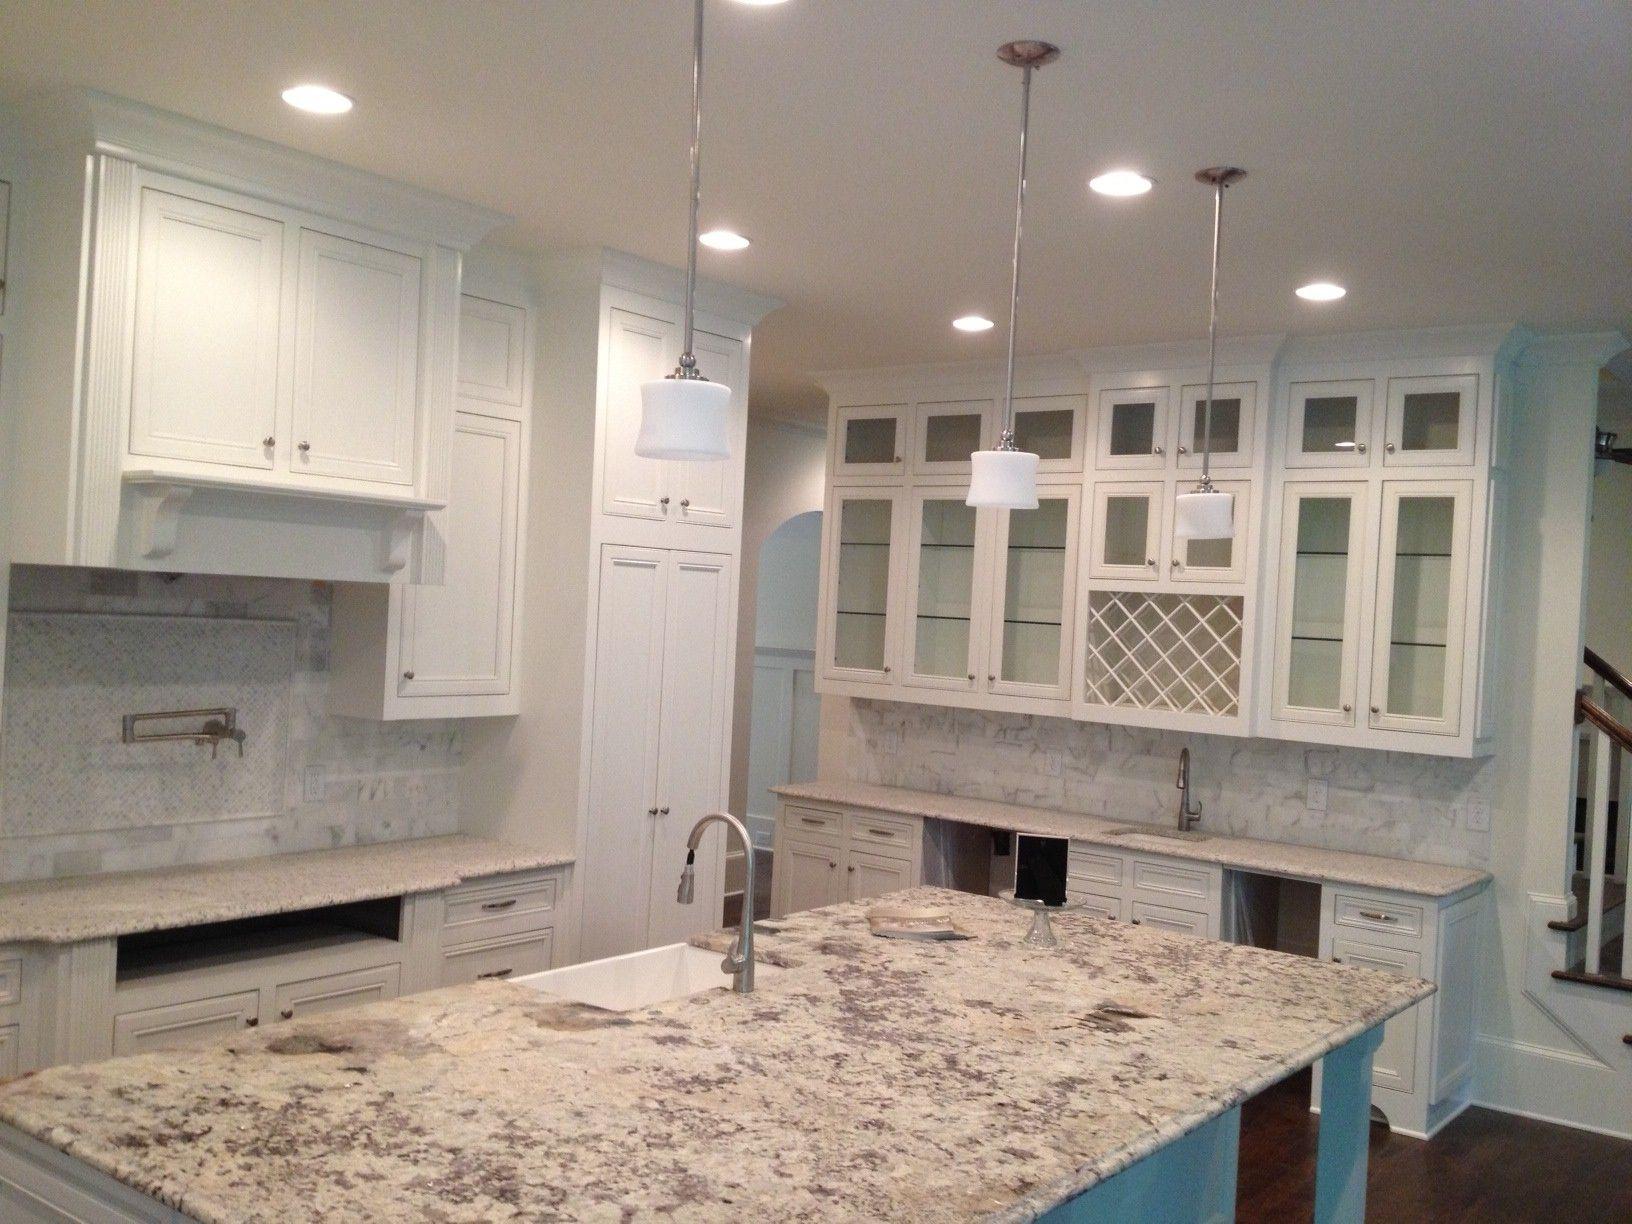 Attractive White Granite Countertops For Bright Kitchen Exciting White Granite Countertops And White Kitchen Cabinet With Tile Backsplash